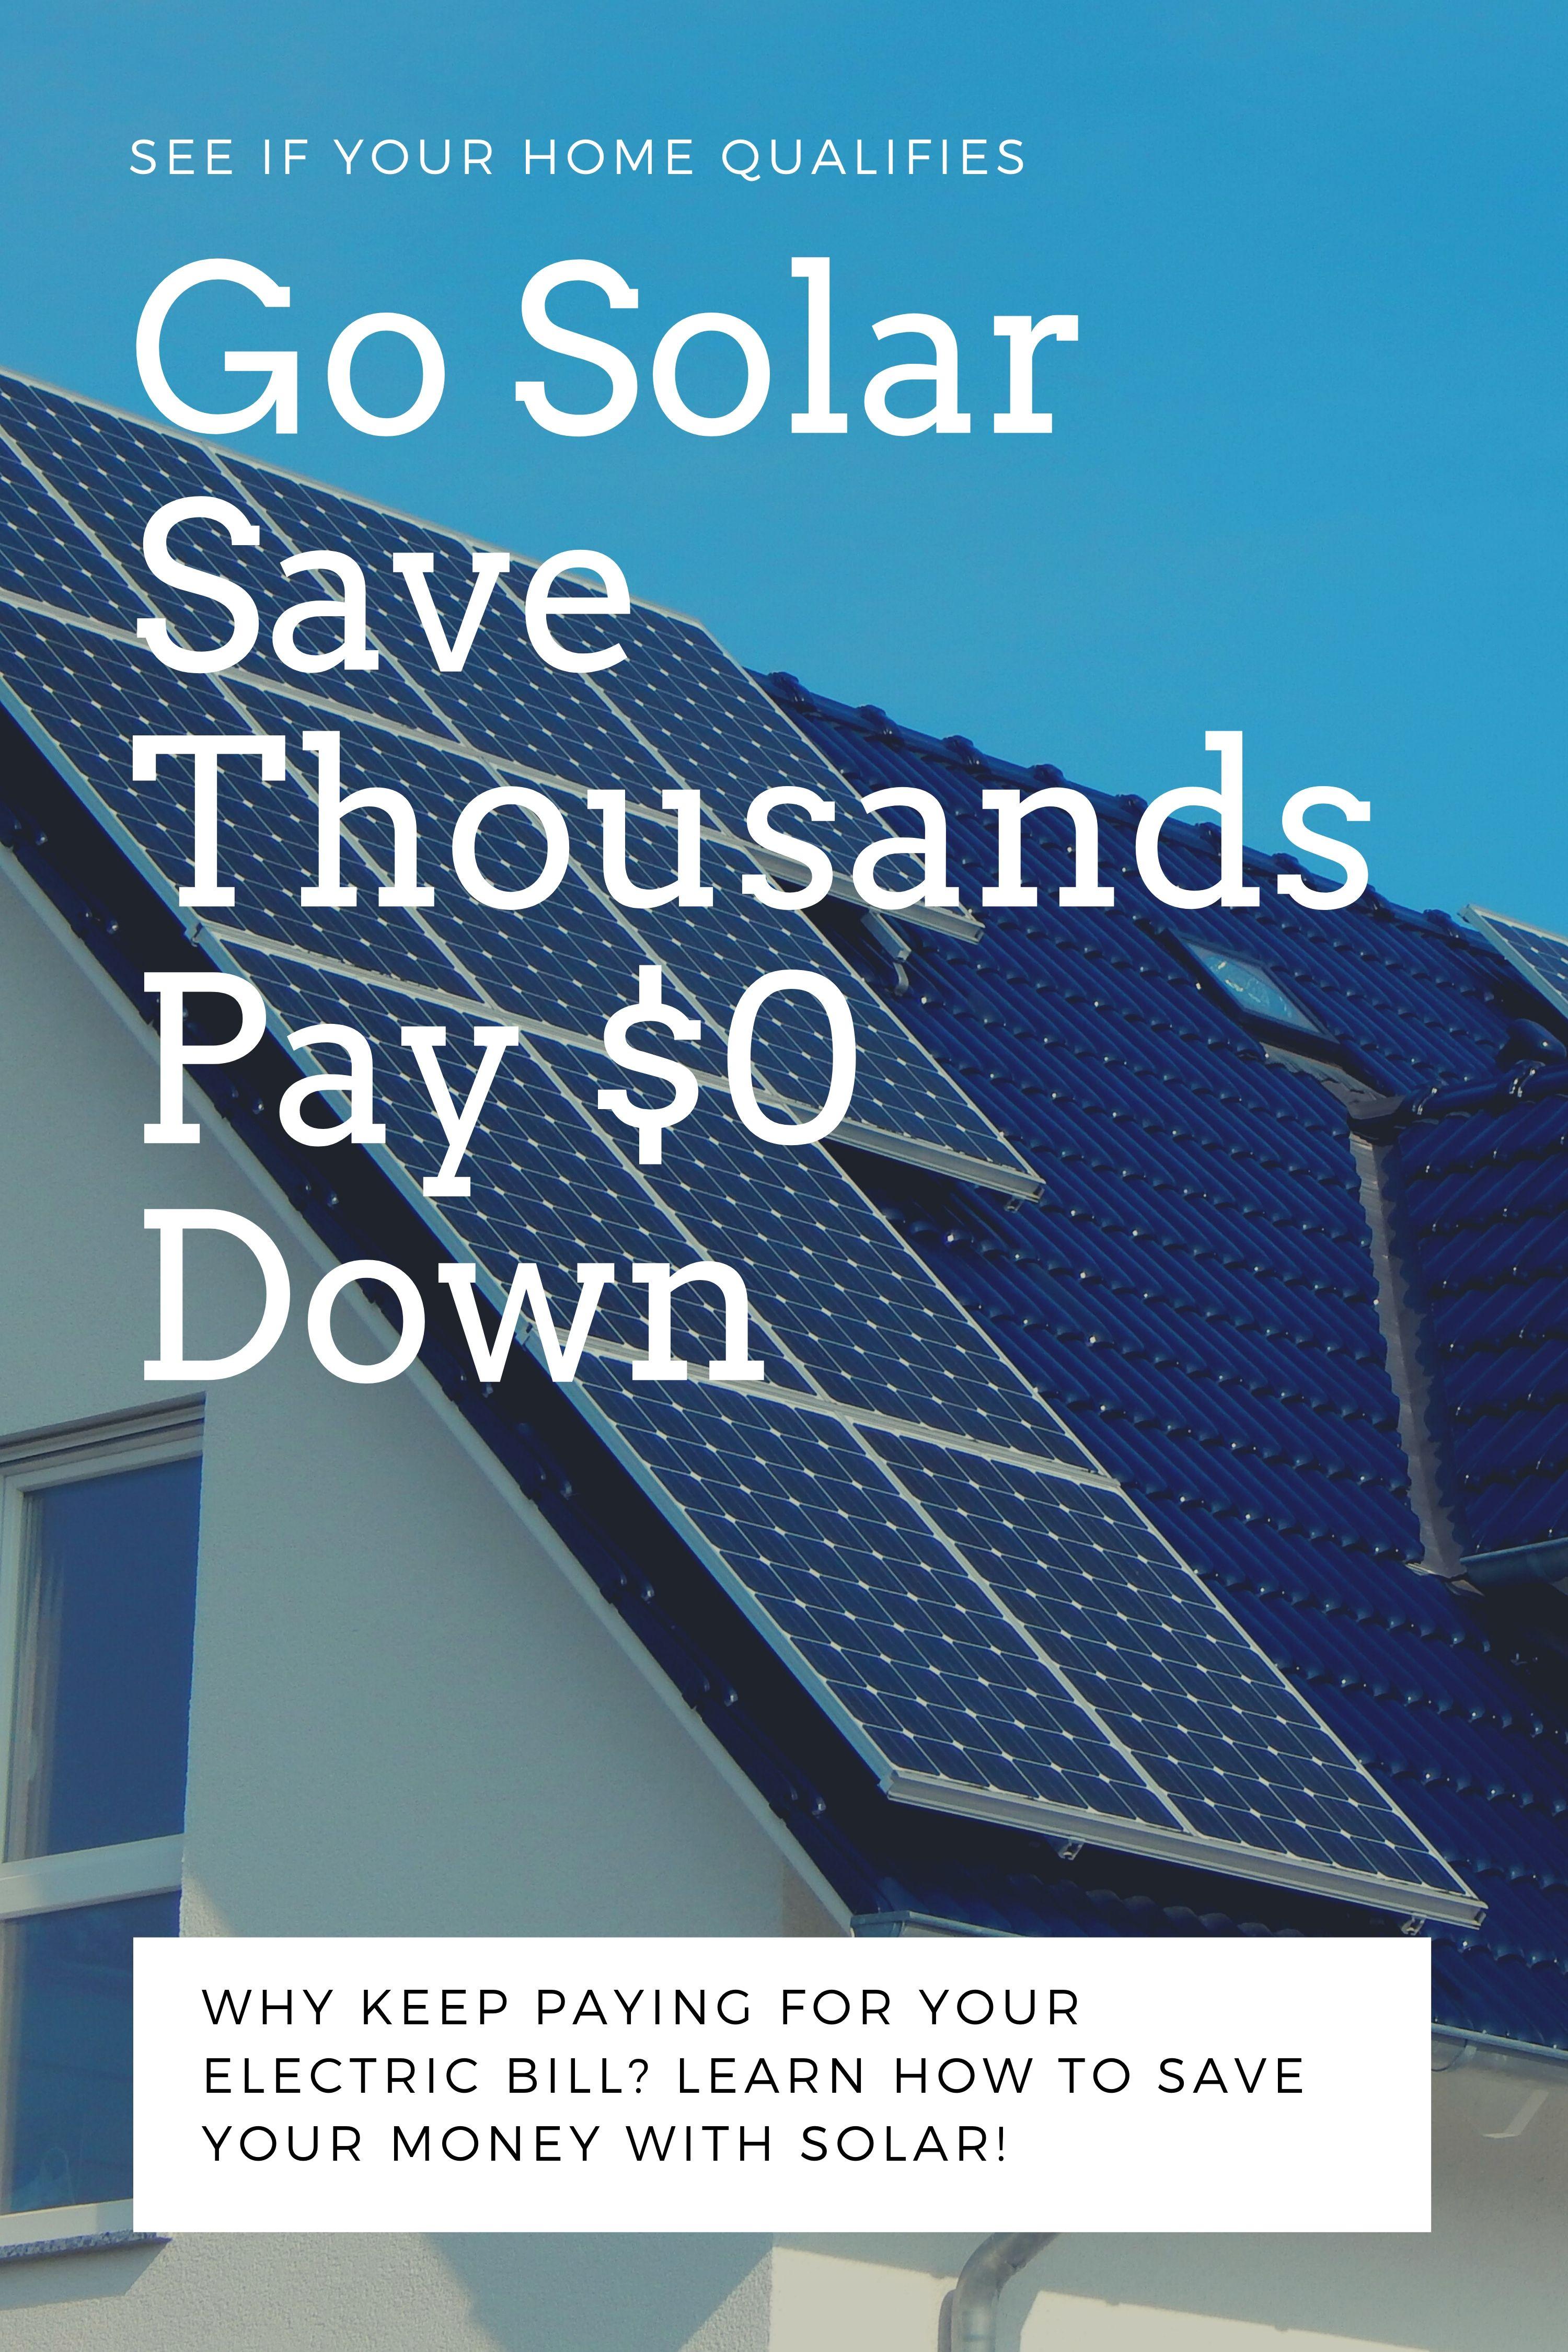 Get Solar Installed For 0 And Get 2 000 Cash Back In 2020 Solar Solar Energy Solar Panels